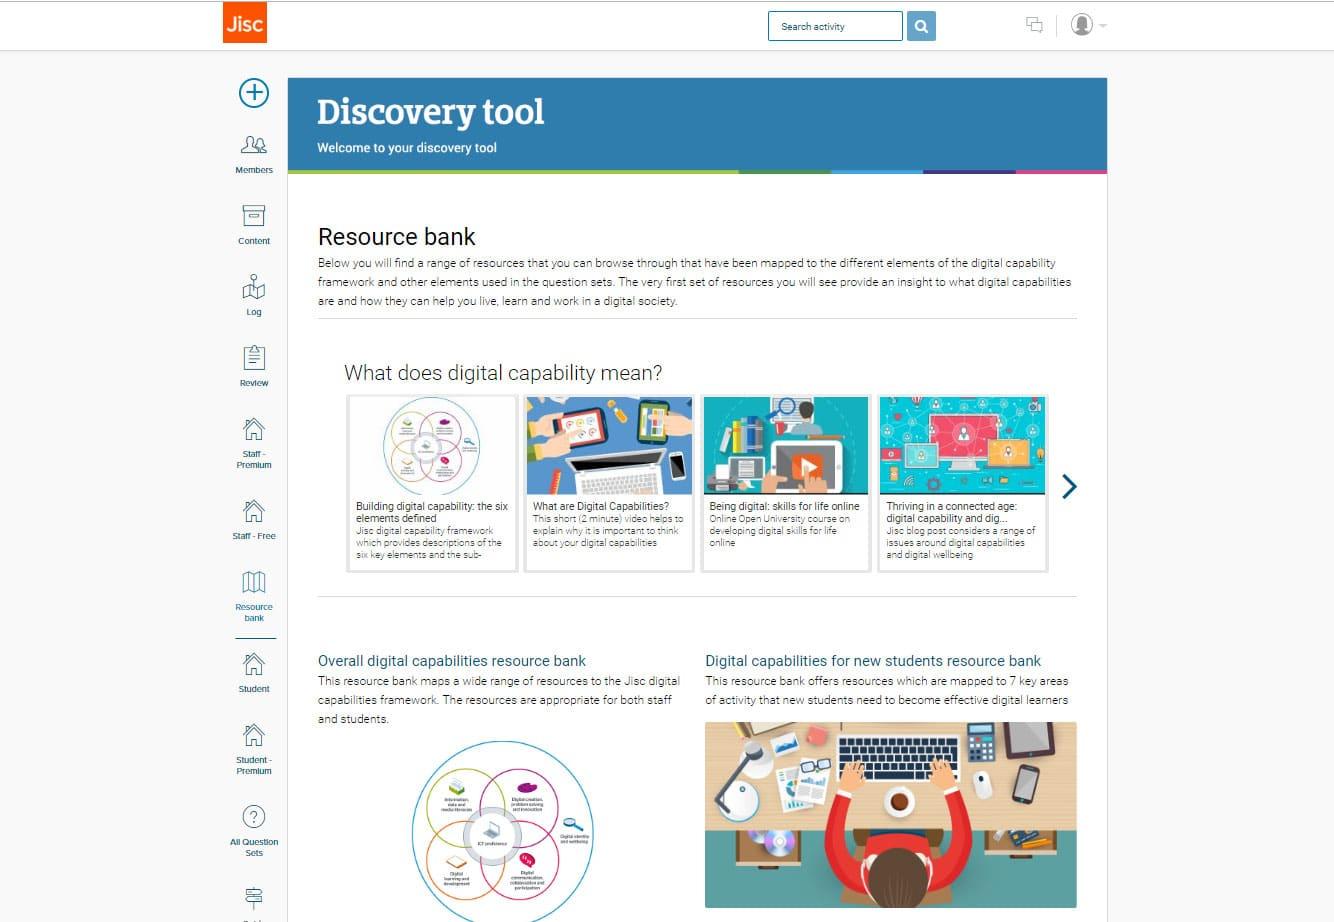 Jisc discovery tool